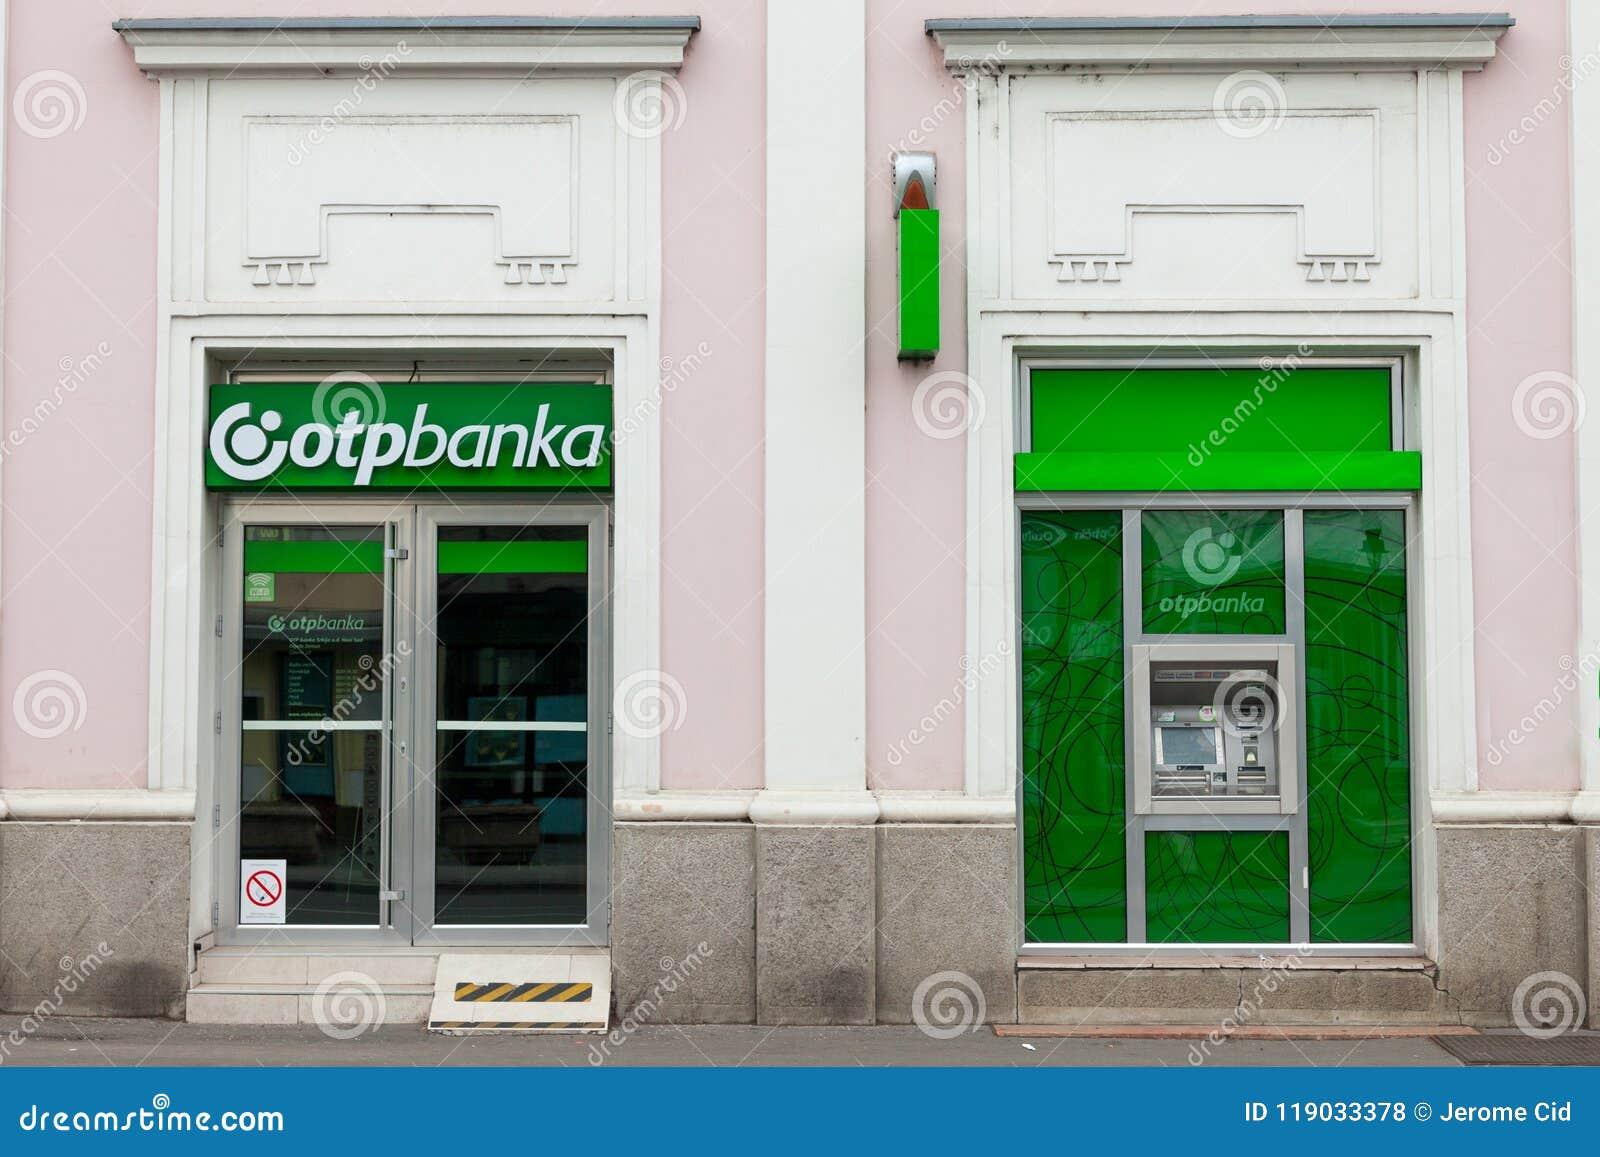 Mailbox otpbank nova mp3 скачать бесплатно